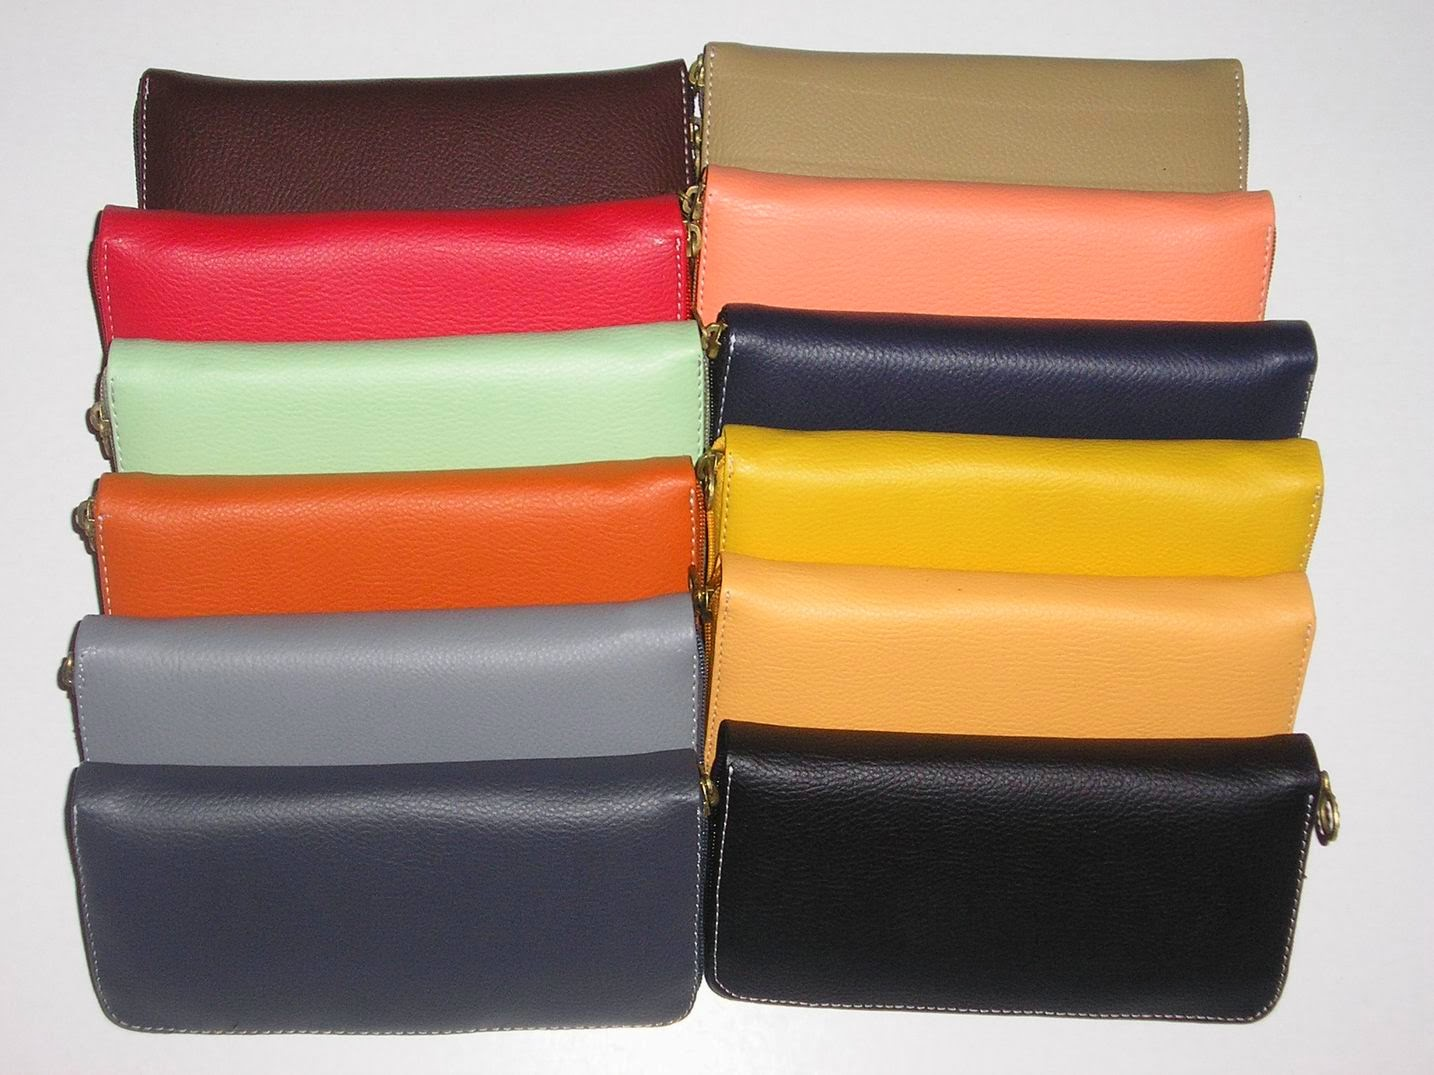 Grosir Dompet Wanita Alamat Grosir Kulakan Distributor Supplier